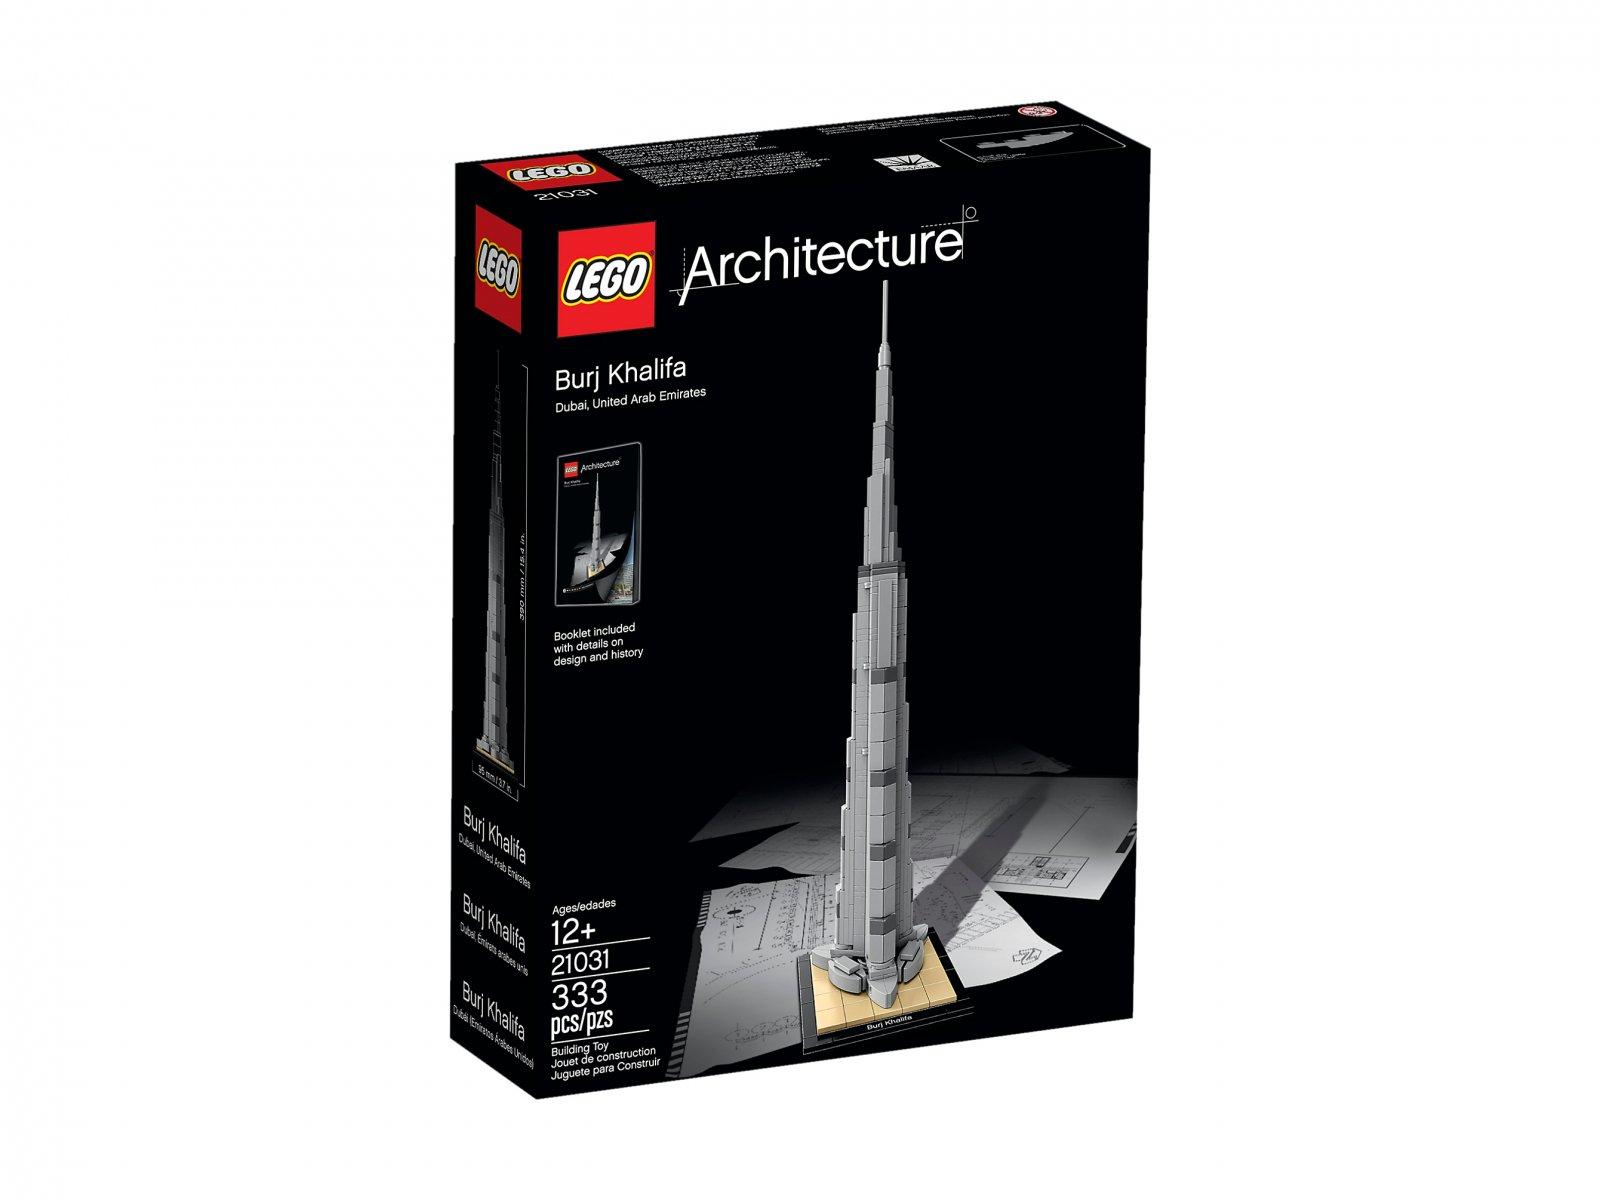 LEGO 21031 Burj Khalifa